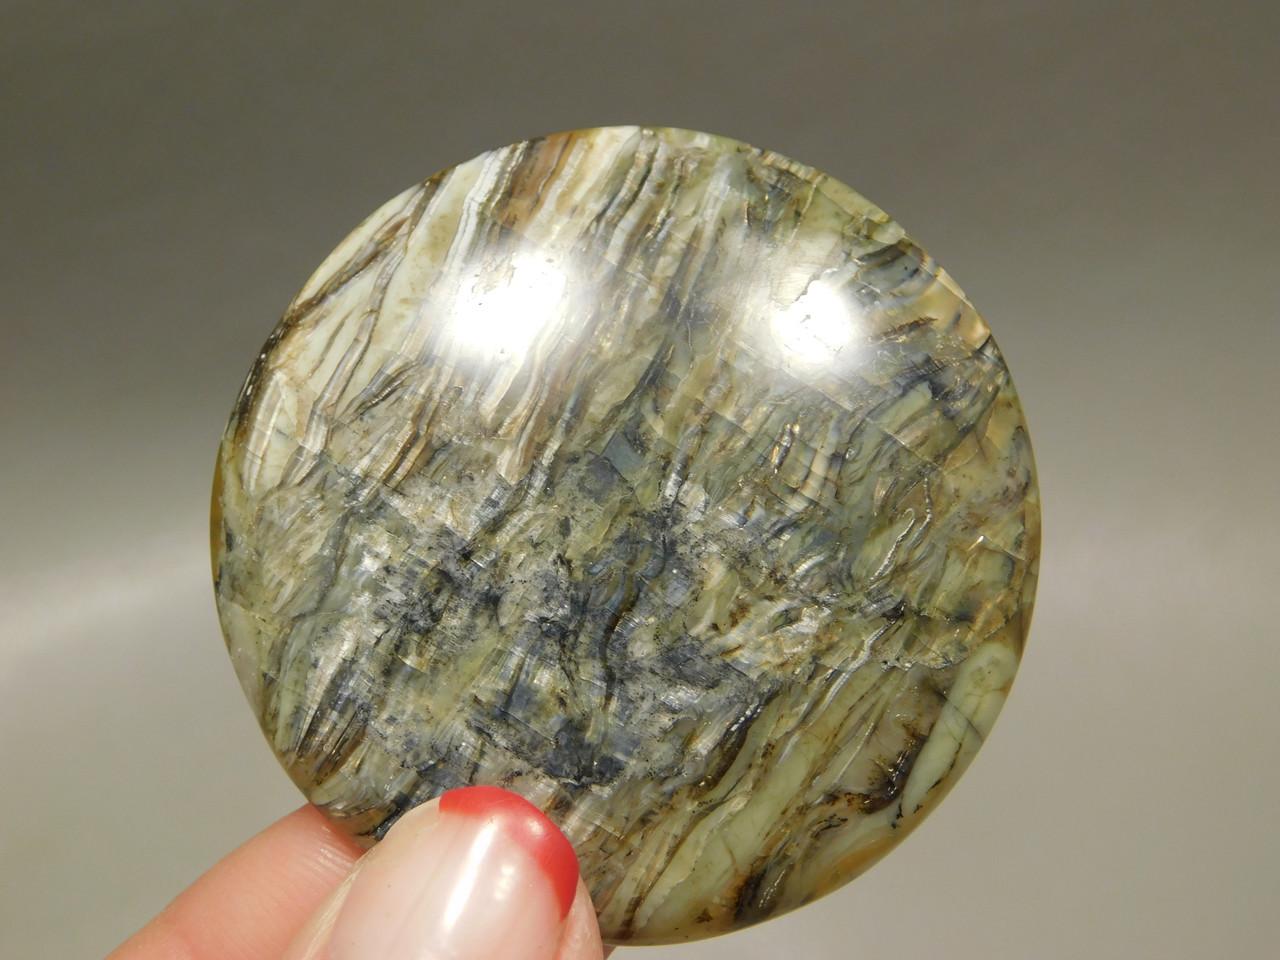 Arizona Tigereye Chatoyant Gemstone Cabochon 41.5 mm Round #6